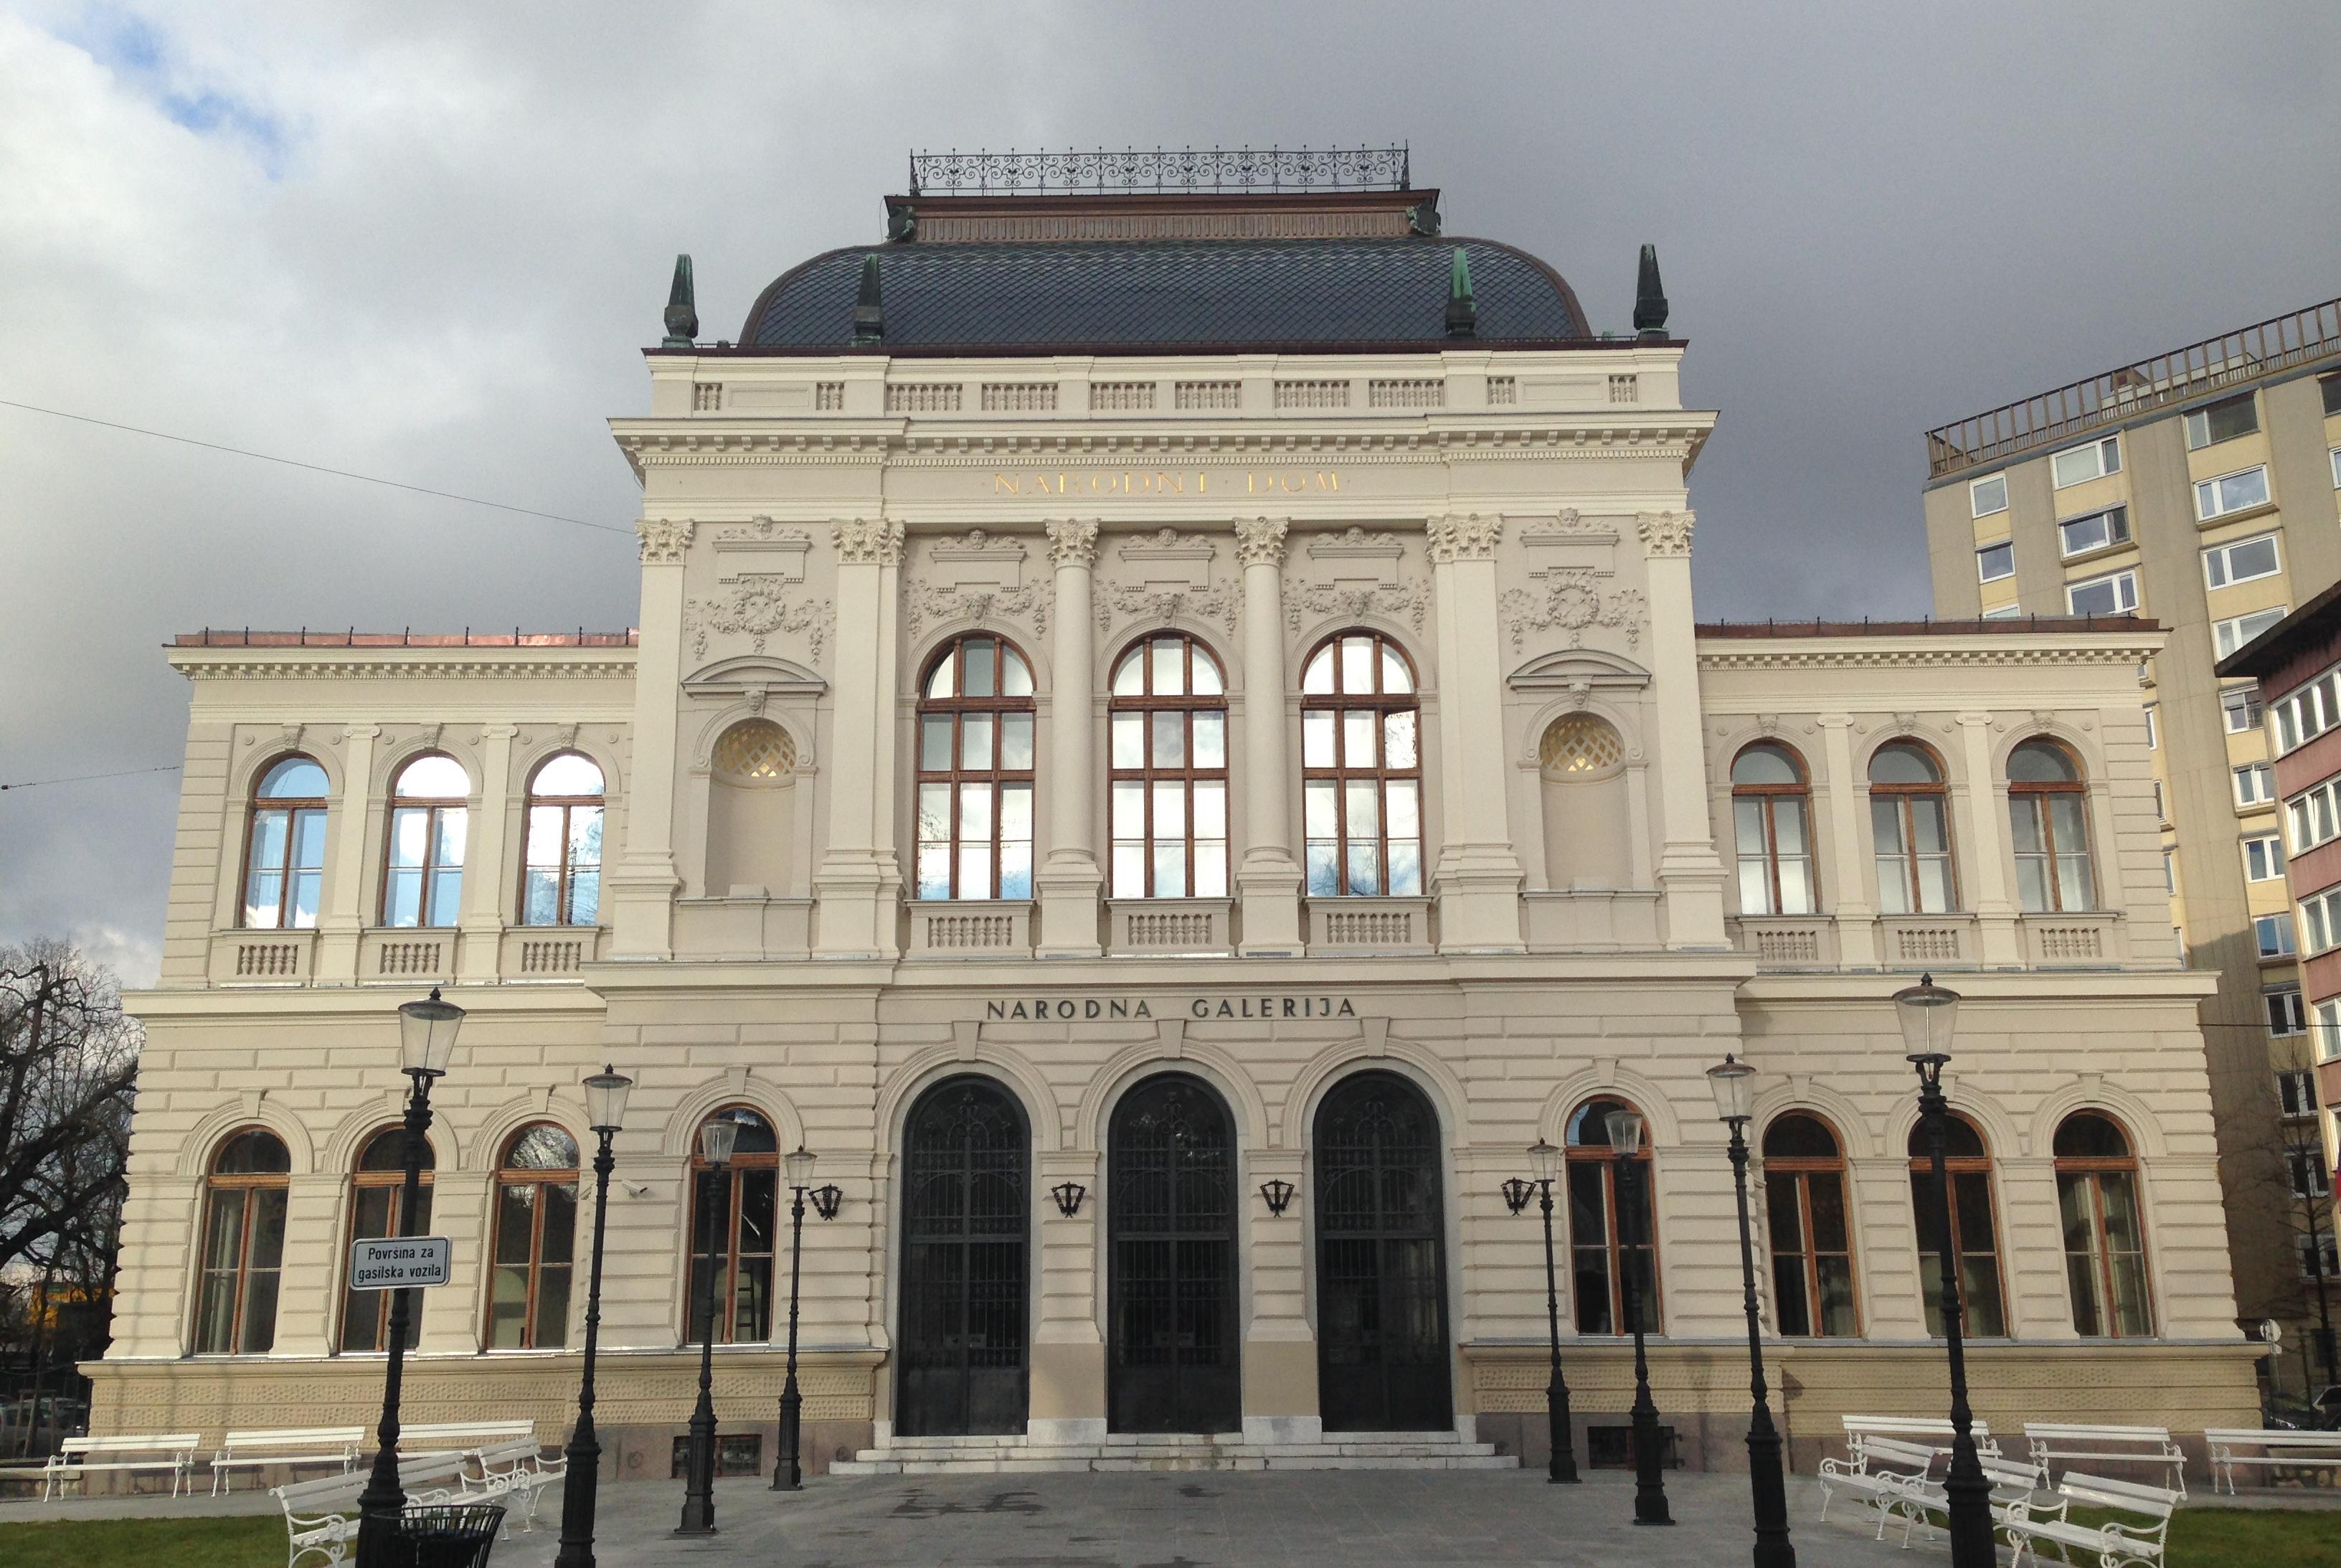 Ljubljana, Narodna galerija